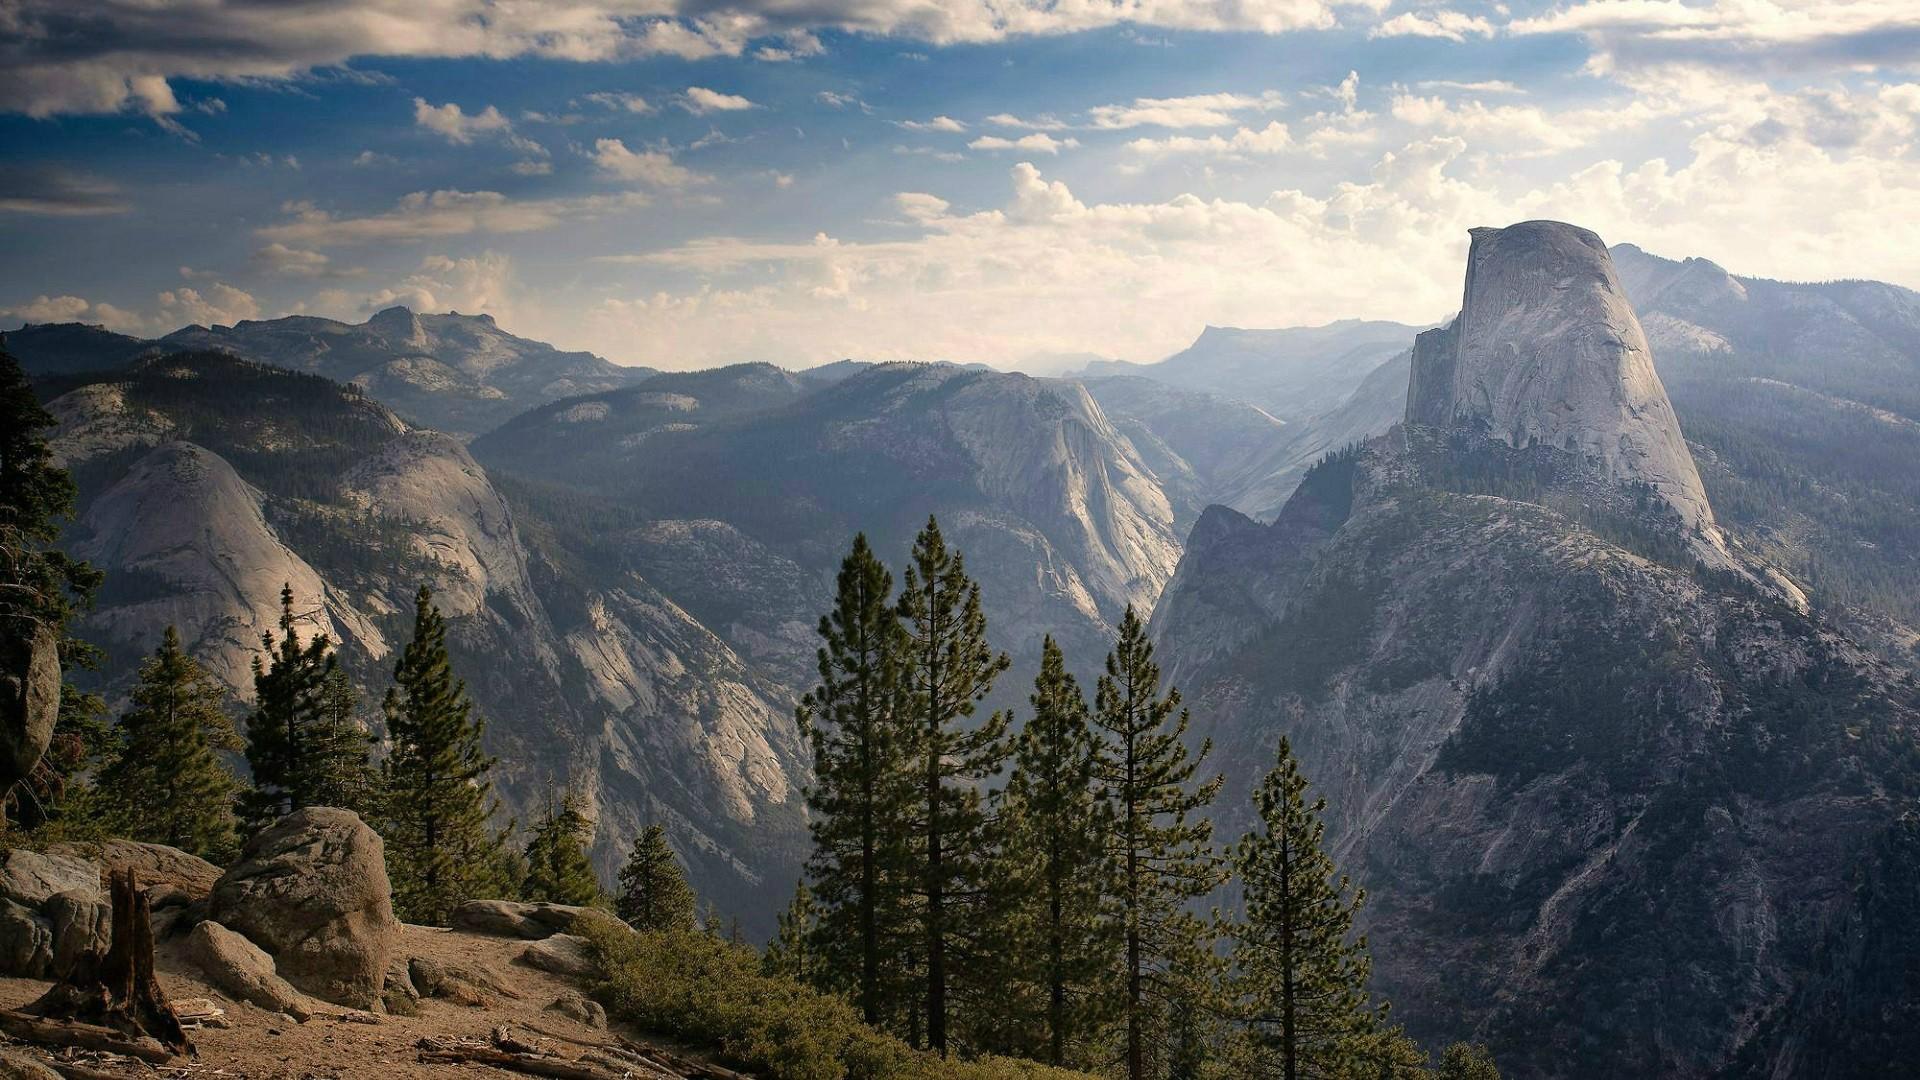 HD Nature - Landscape Wallpapers 3